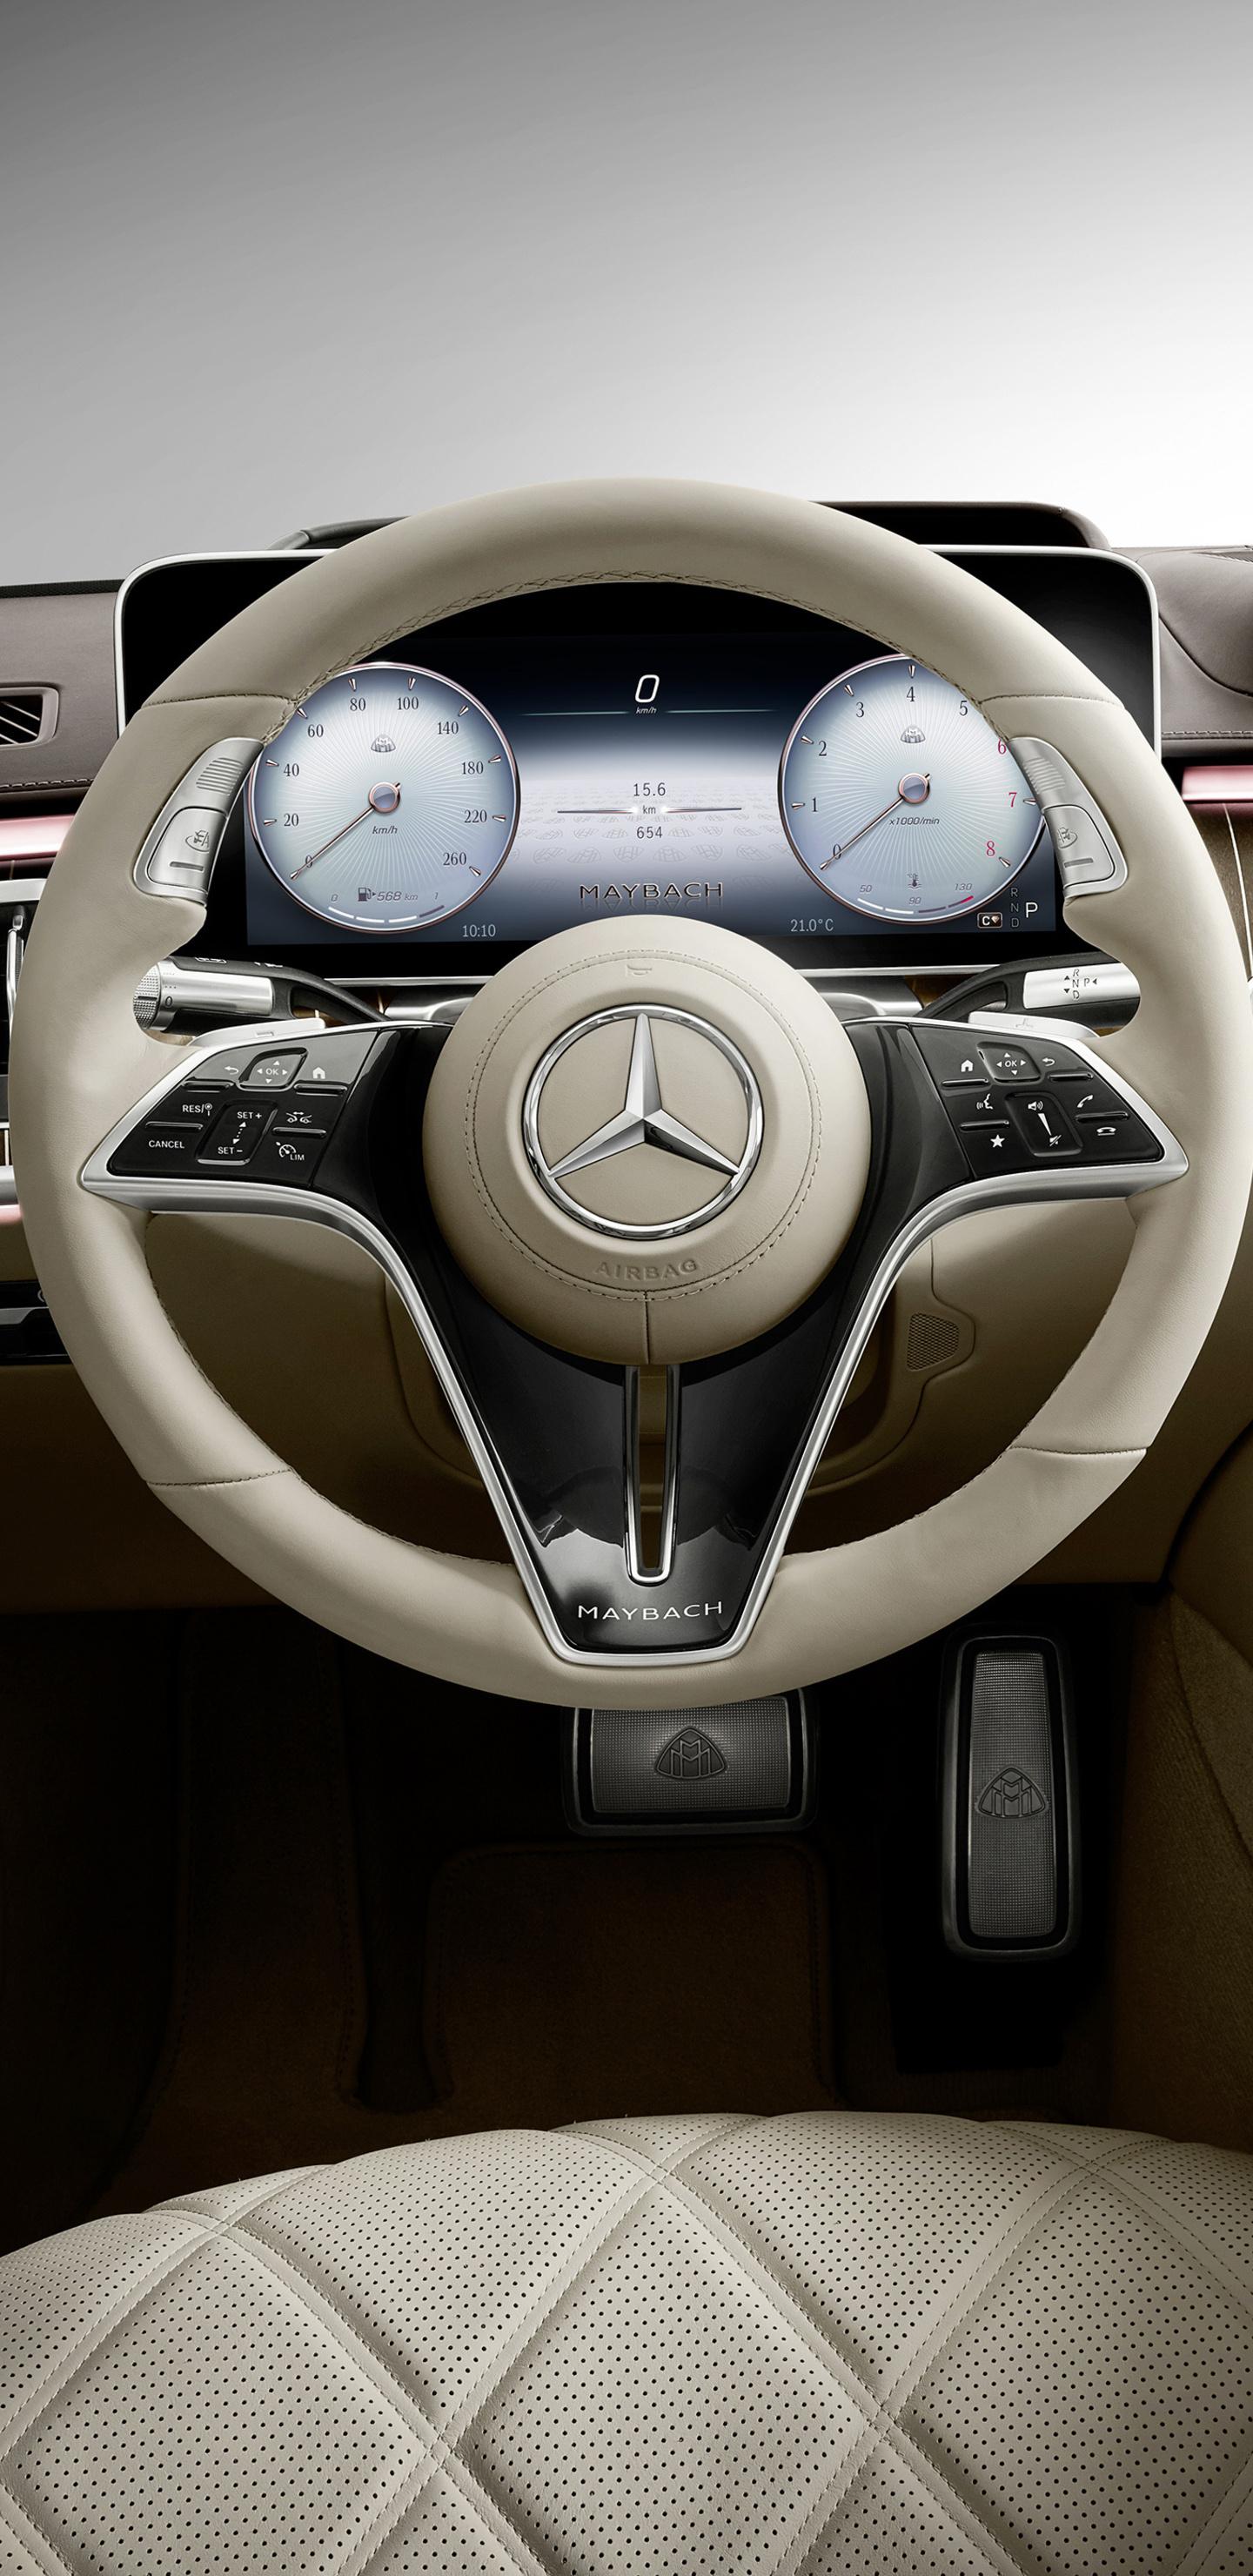 mercedes-s-class-maybach-interior-5k-ca.jpg